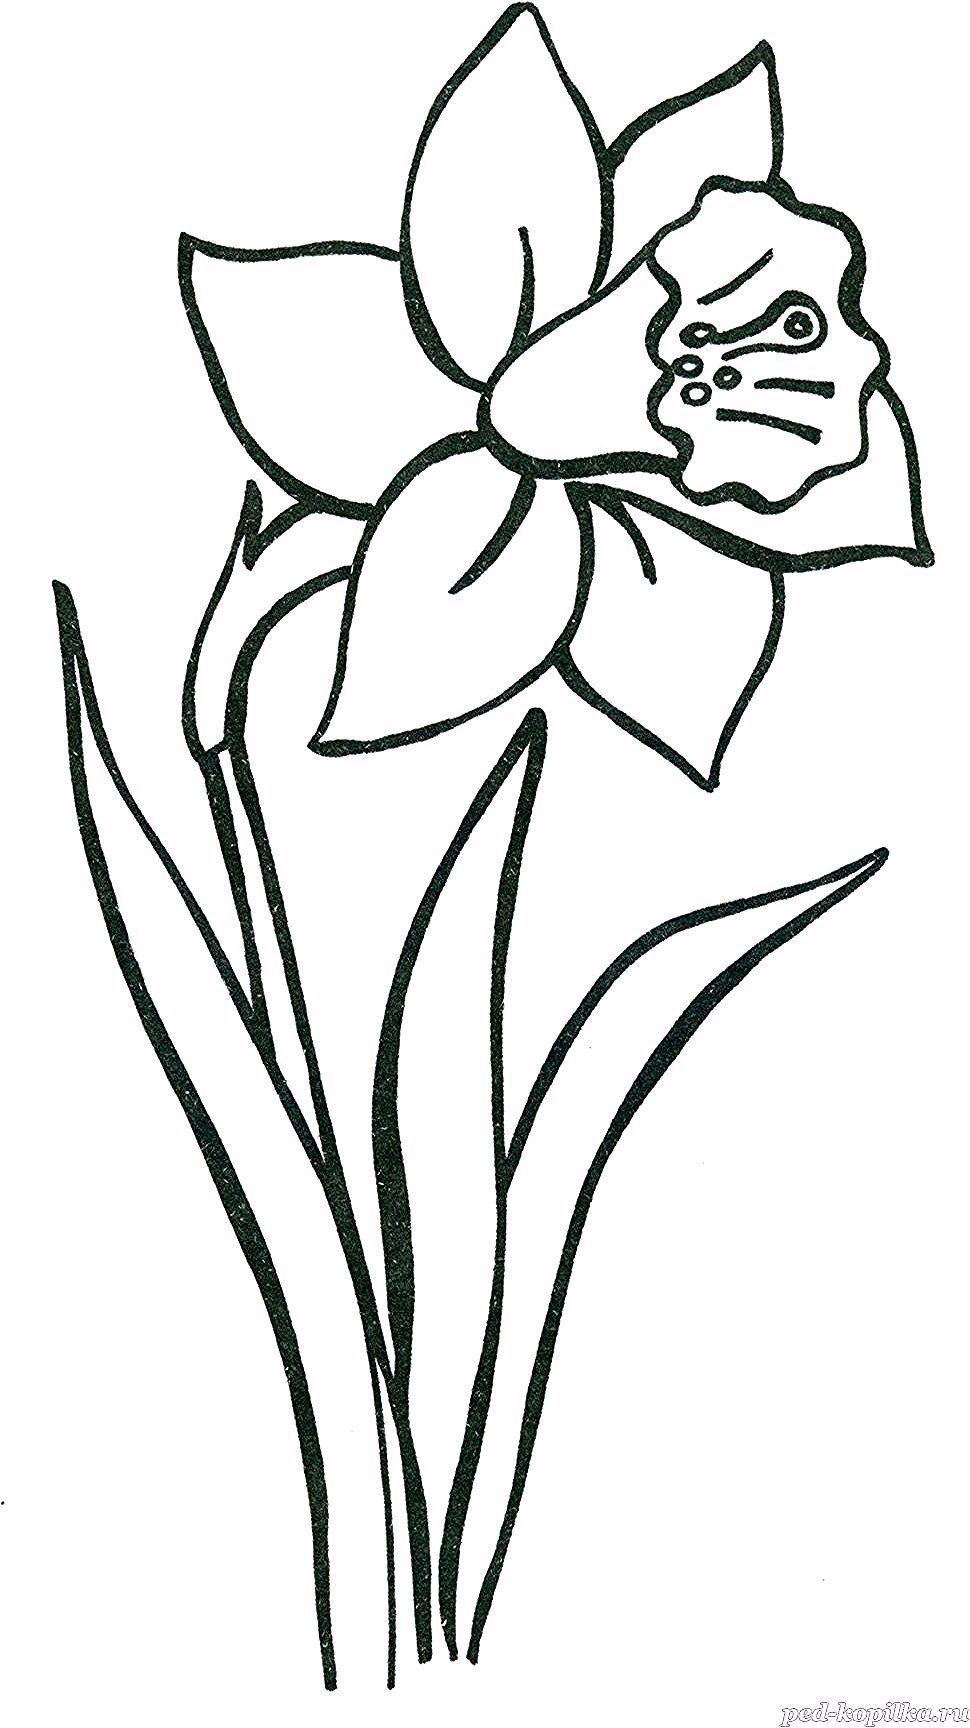 Pin By J Gora On Zumbul In 2020 Flower Drawing Embroidery Flowers Pattern Diy Embroidery Flowers